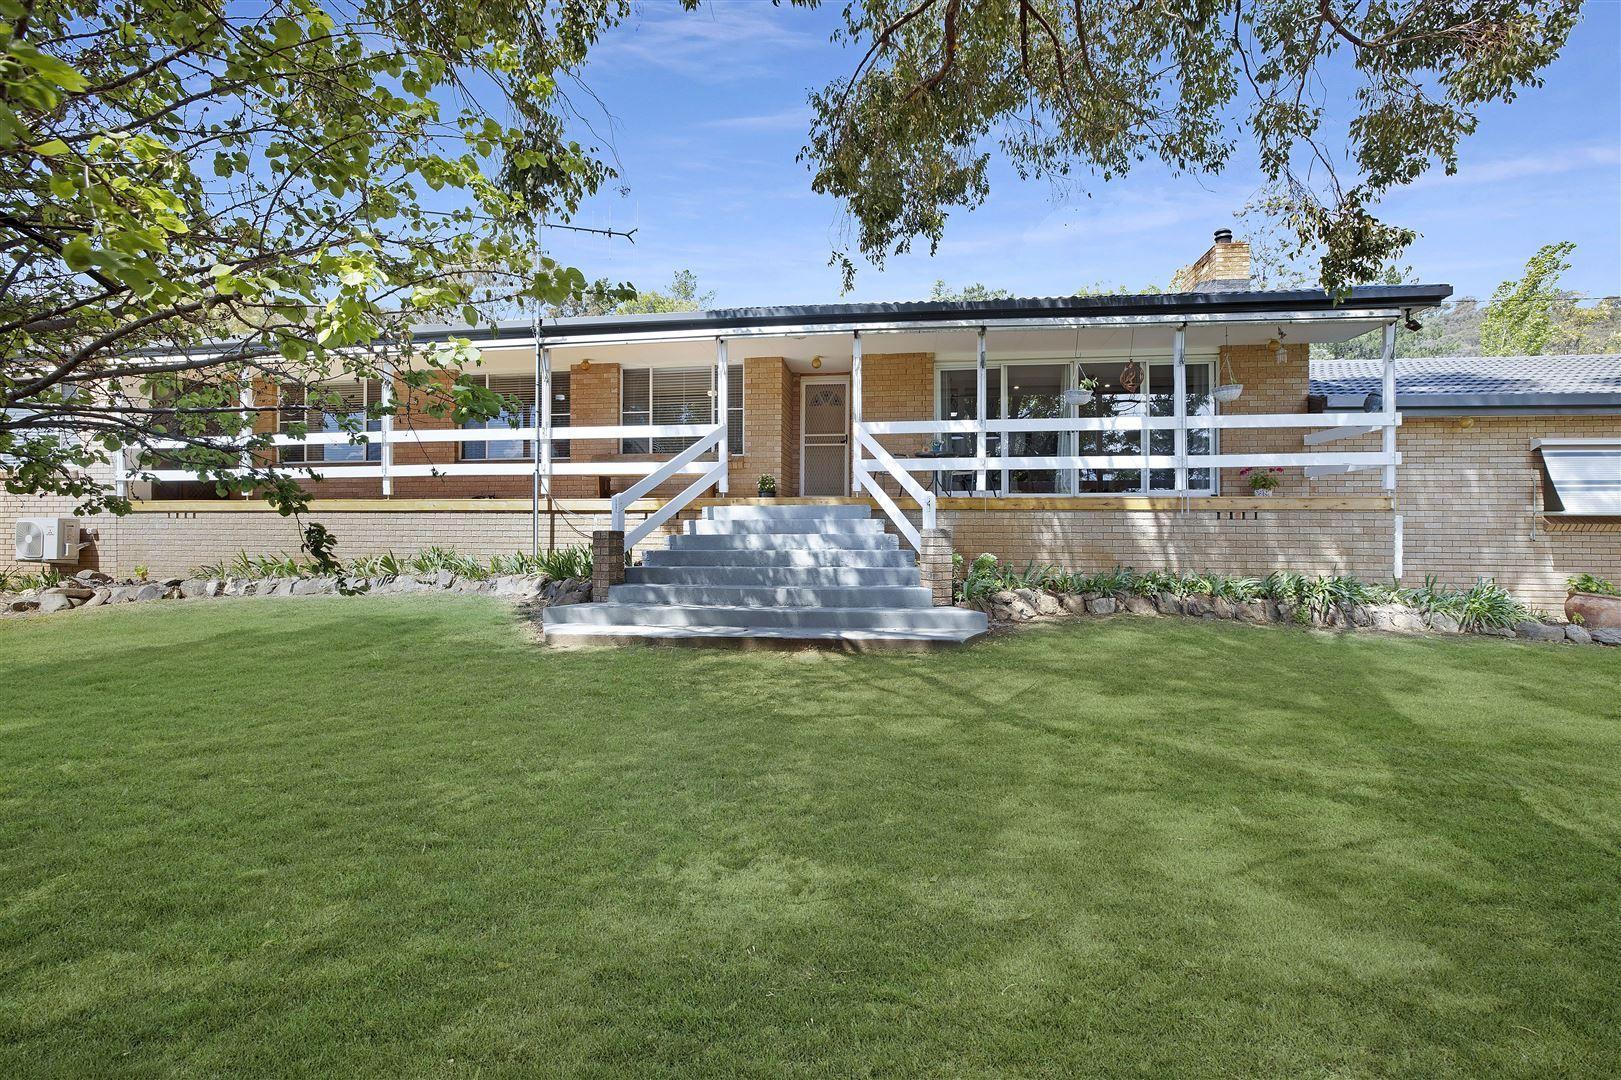 2193 Hill End Road Grattai, Mudgee NSW 2850, Image 0